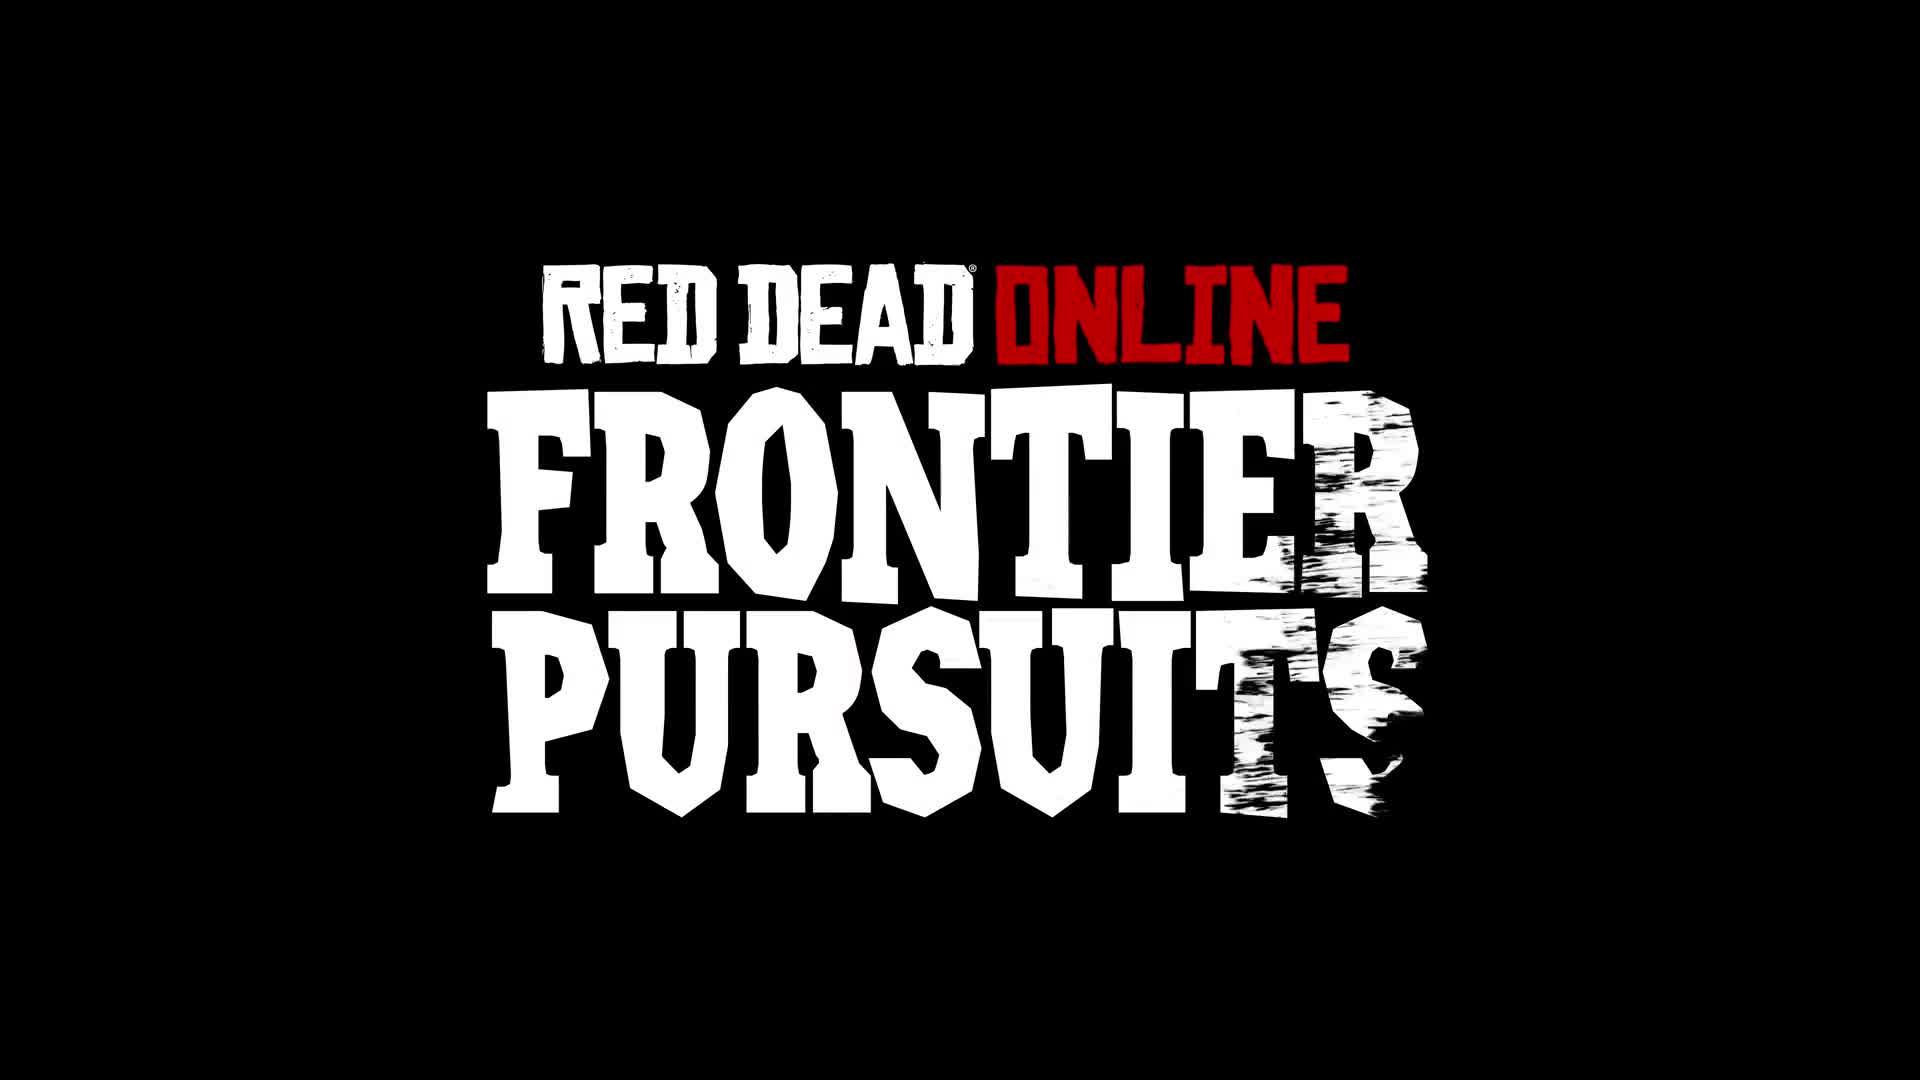 Red Dead Online: Frontier Pursuits [HD] screen capture